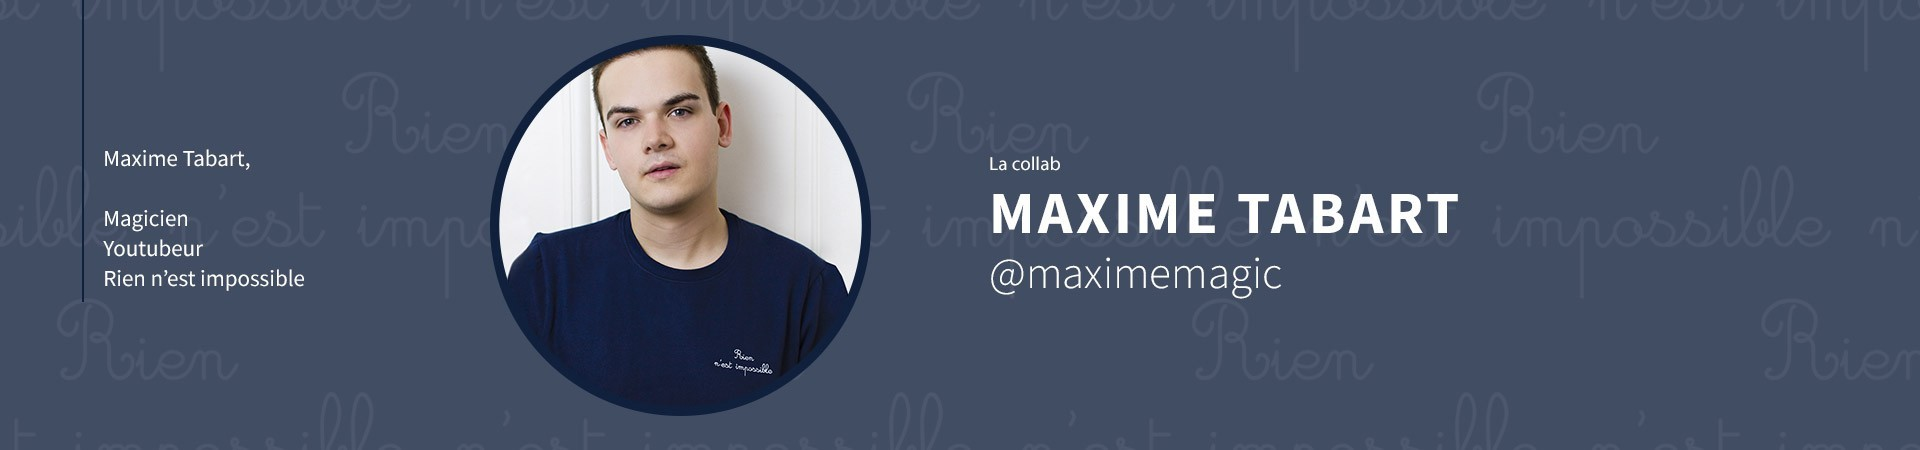 Maxime Tabart